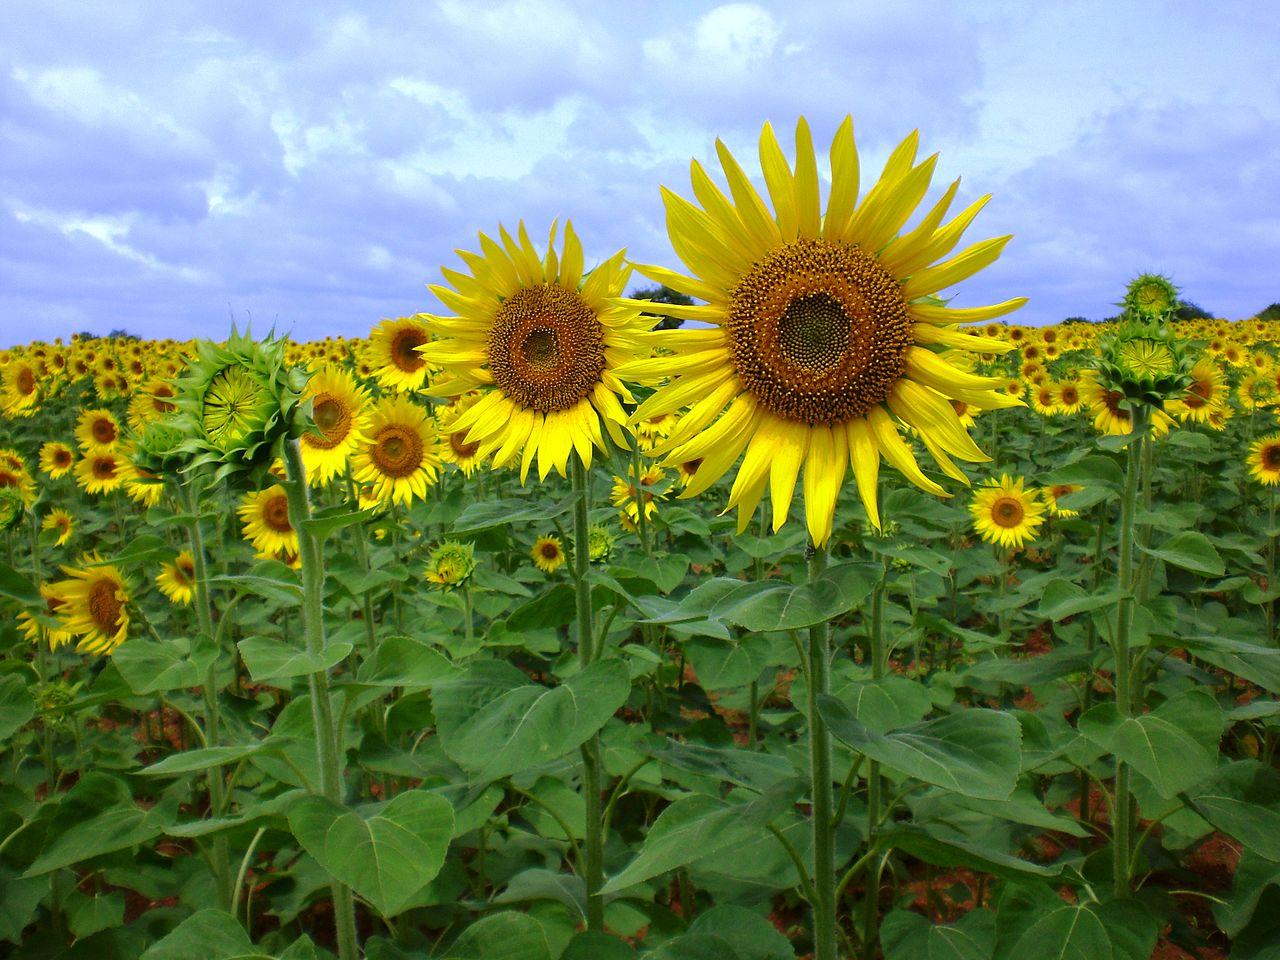 File:Sunflower near Raichur, India.JPG - Wikimedia Commons